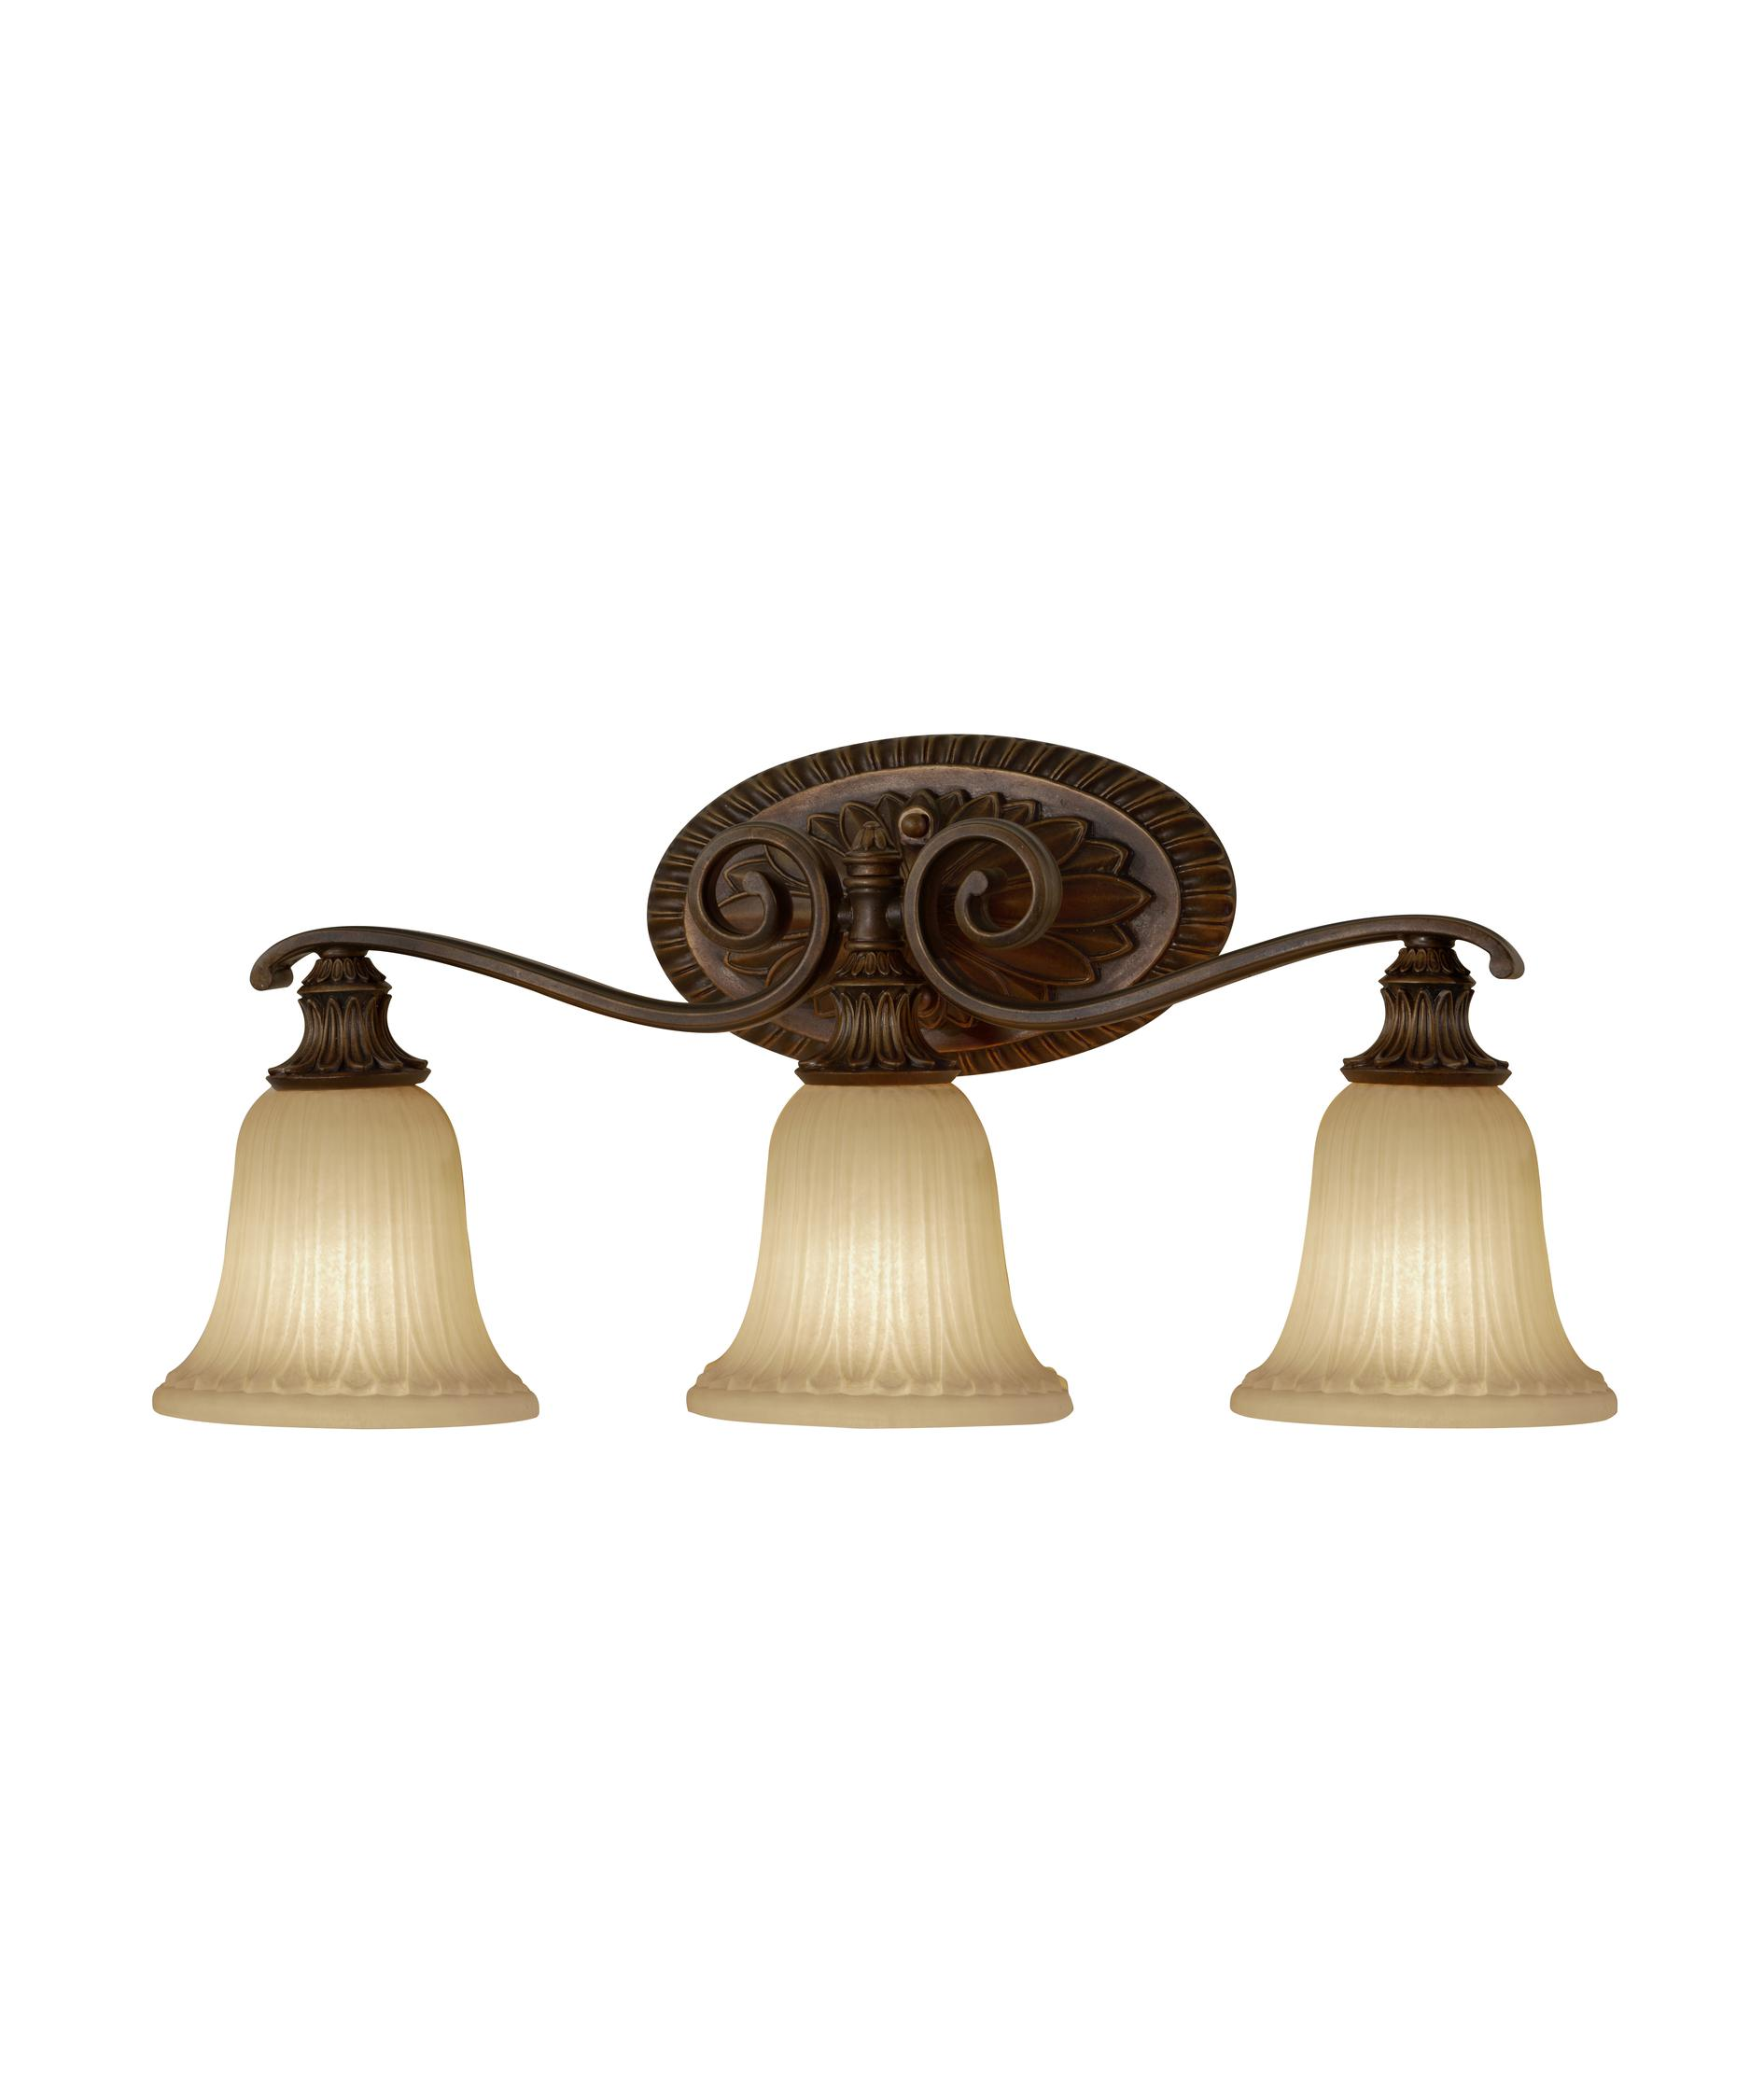 murray feiss francine 24 inch bath vanity light capitol lighting 1. Black Bedroom Furniture Sets. Home Design Ideas